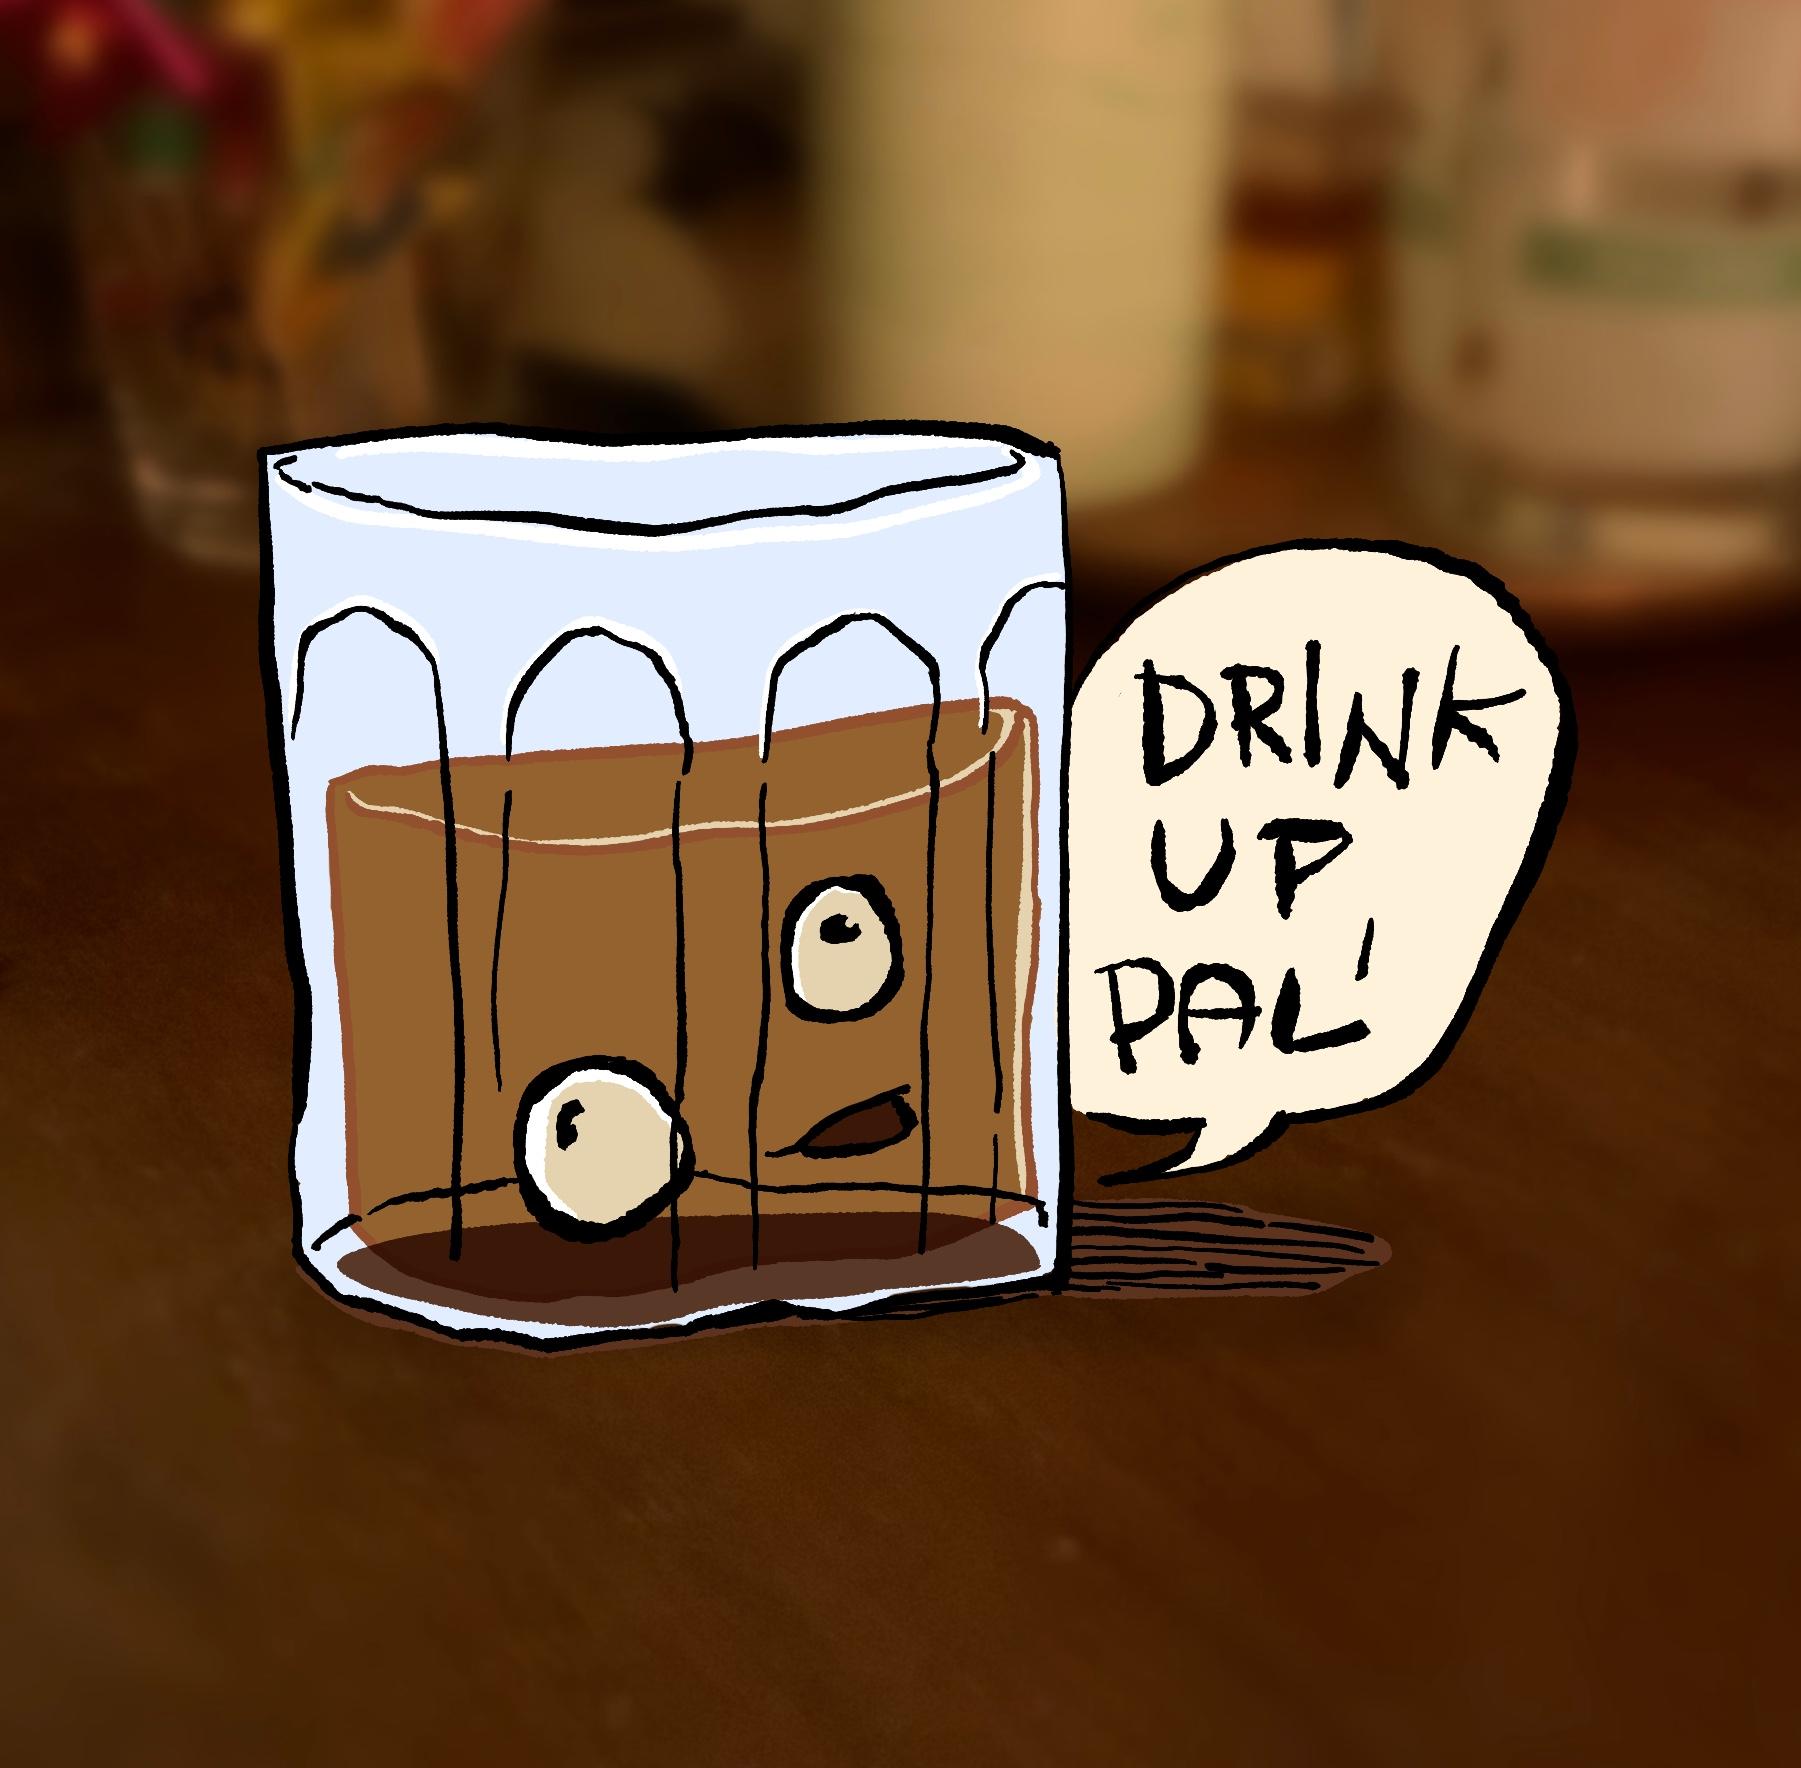 Drink up pal